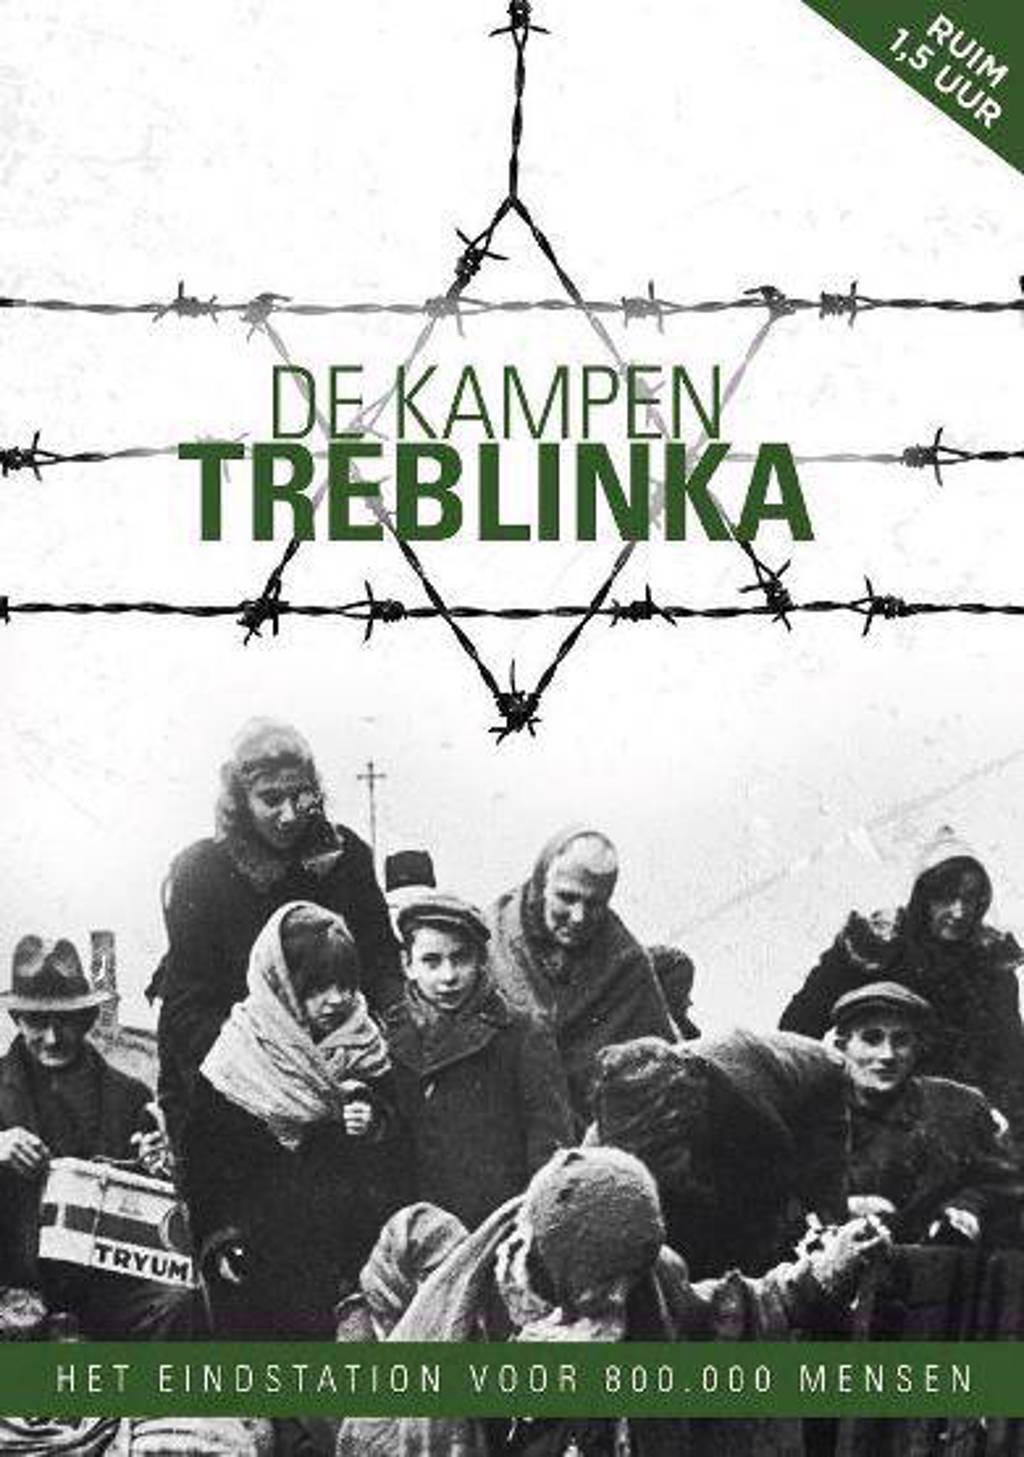 De kampen - Treblinka (DVD)